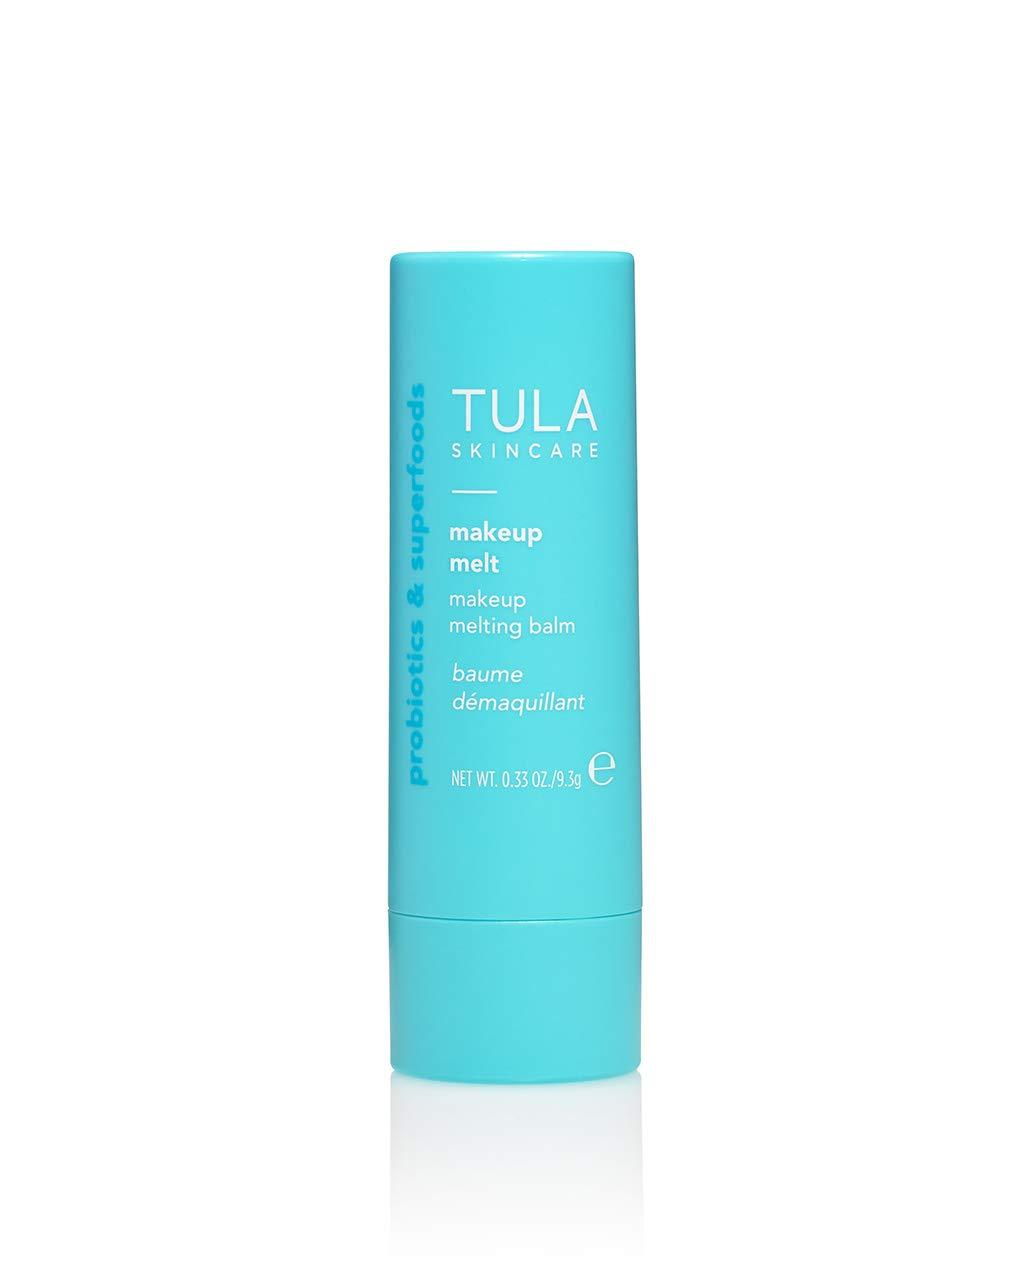 TULA Probiotic Skin Care Makeup Melt Makeup Removing Balm | Travel-Friendly, Dissolves Stubborn Makeup and Softens Skin | 0.32 oz